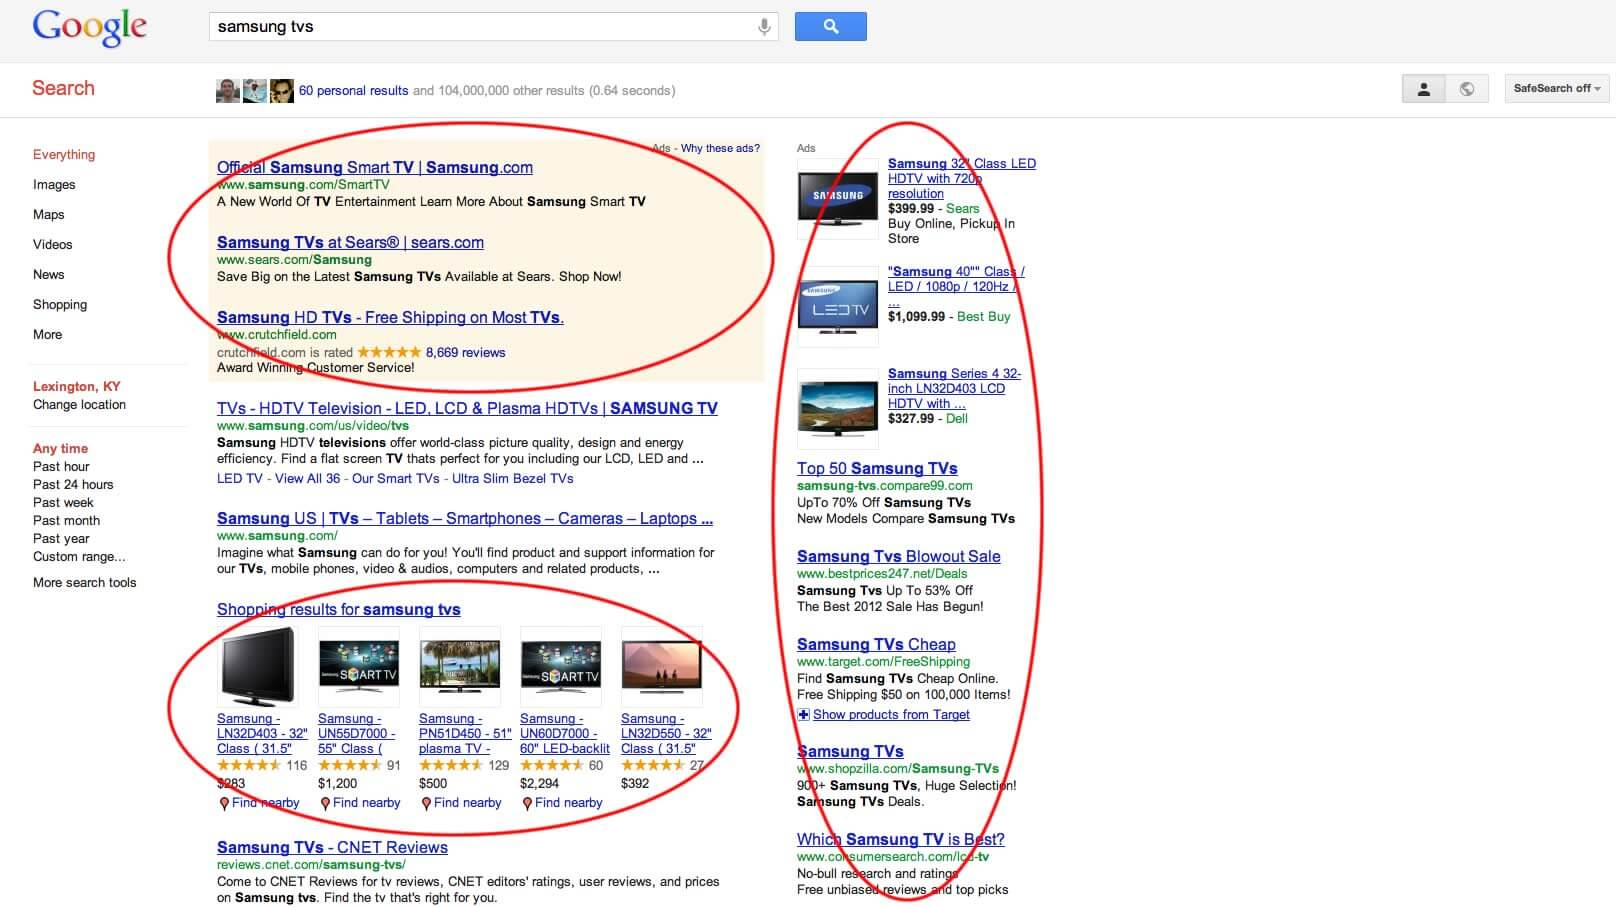 A Google vajon magát is bünteti?